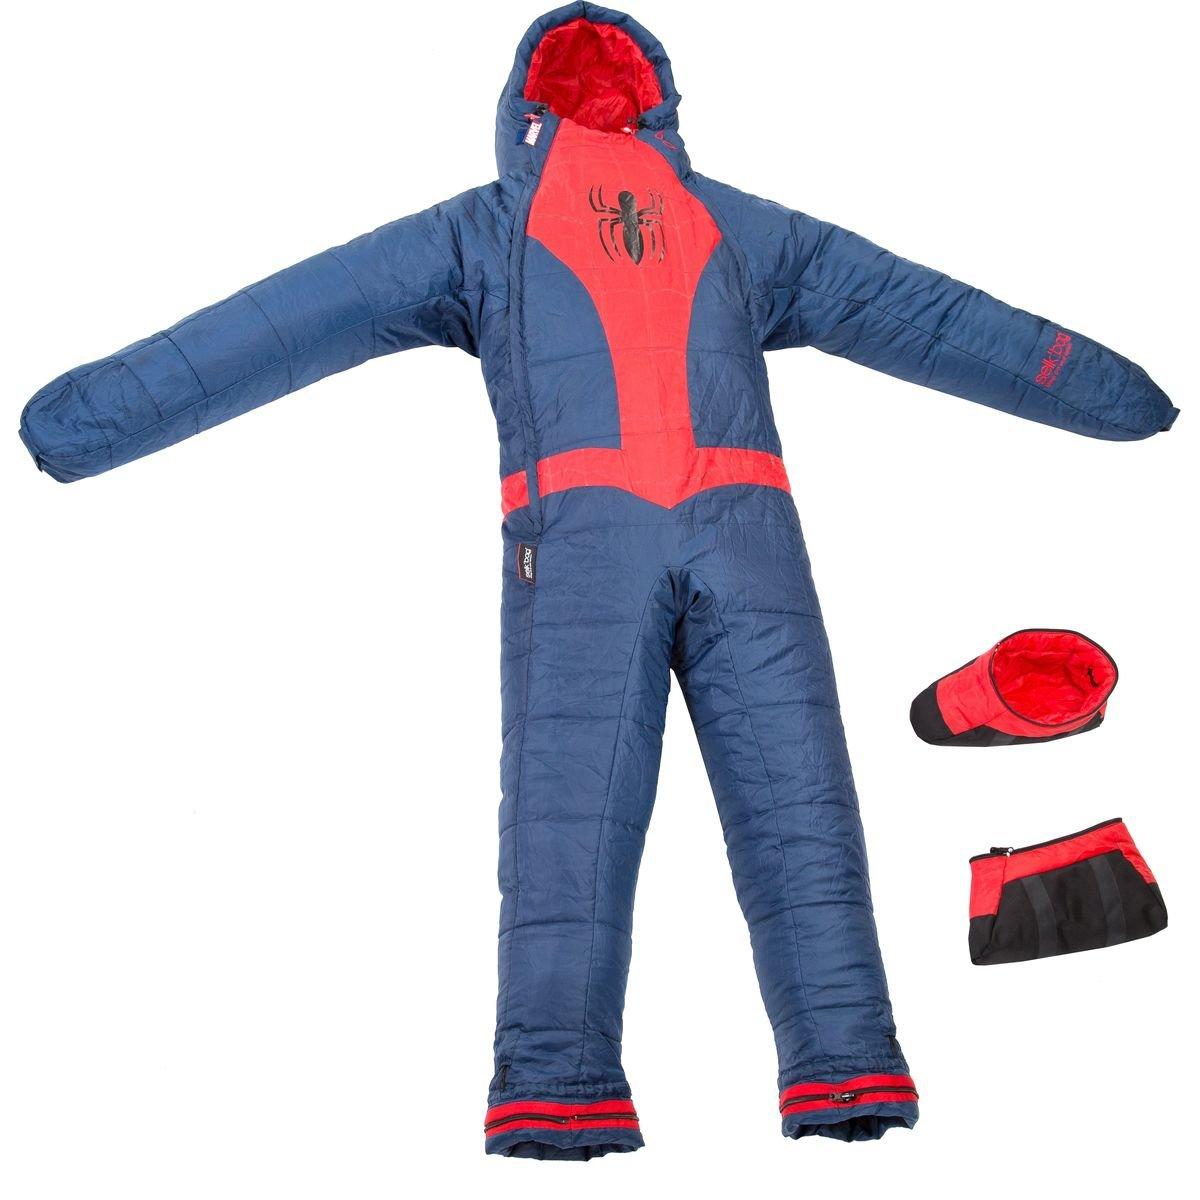 Selk'bag Youth Marvel Spider Man Sleeping Bag, Blue, Medium B015JPB3PQ